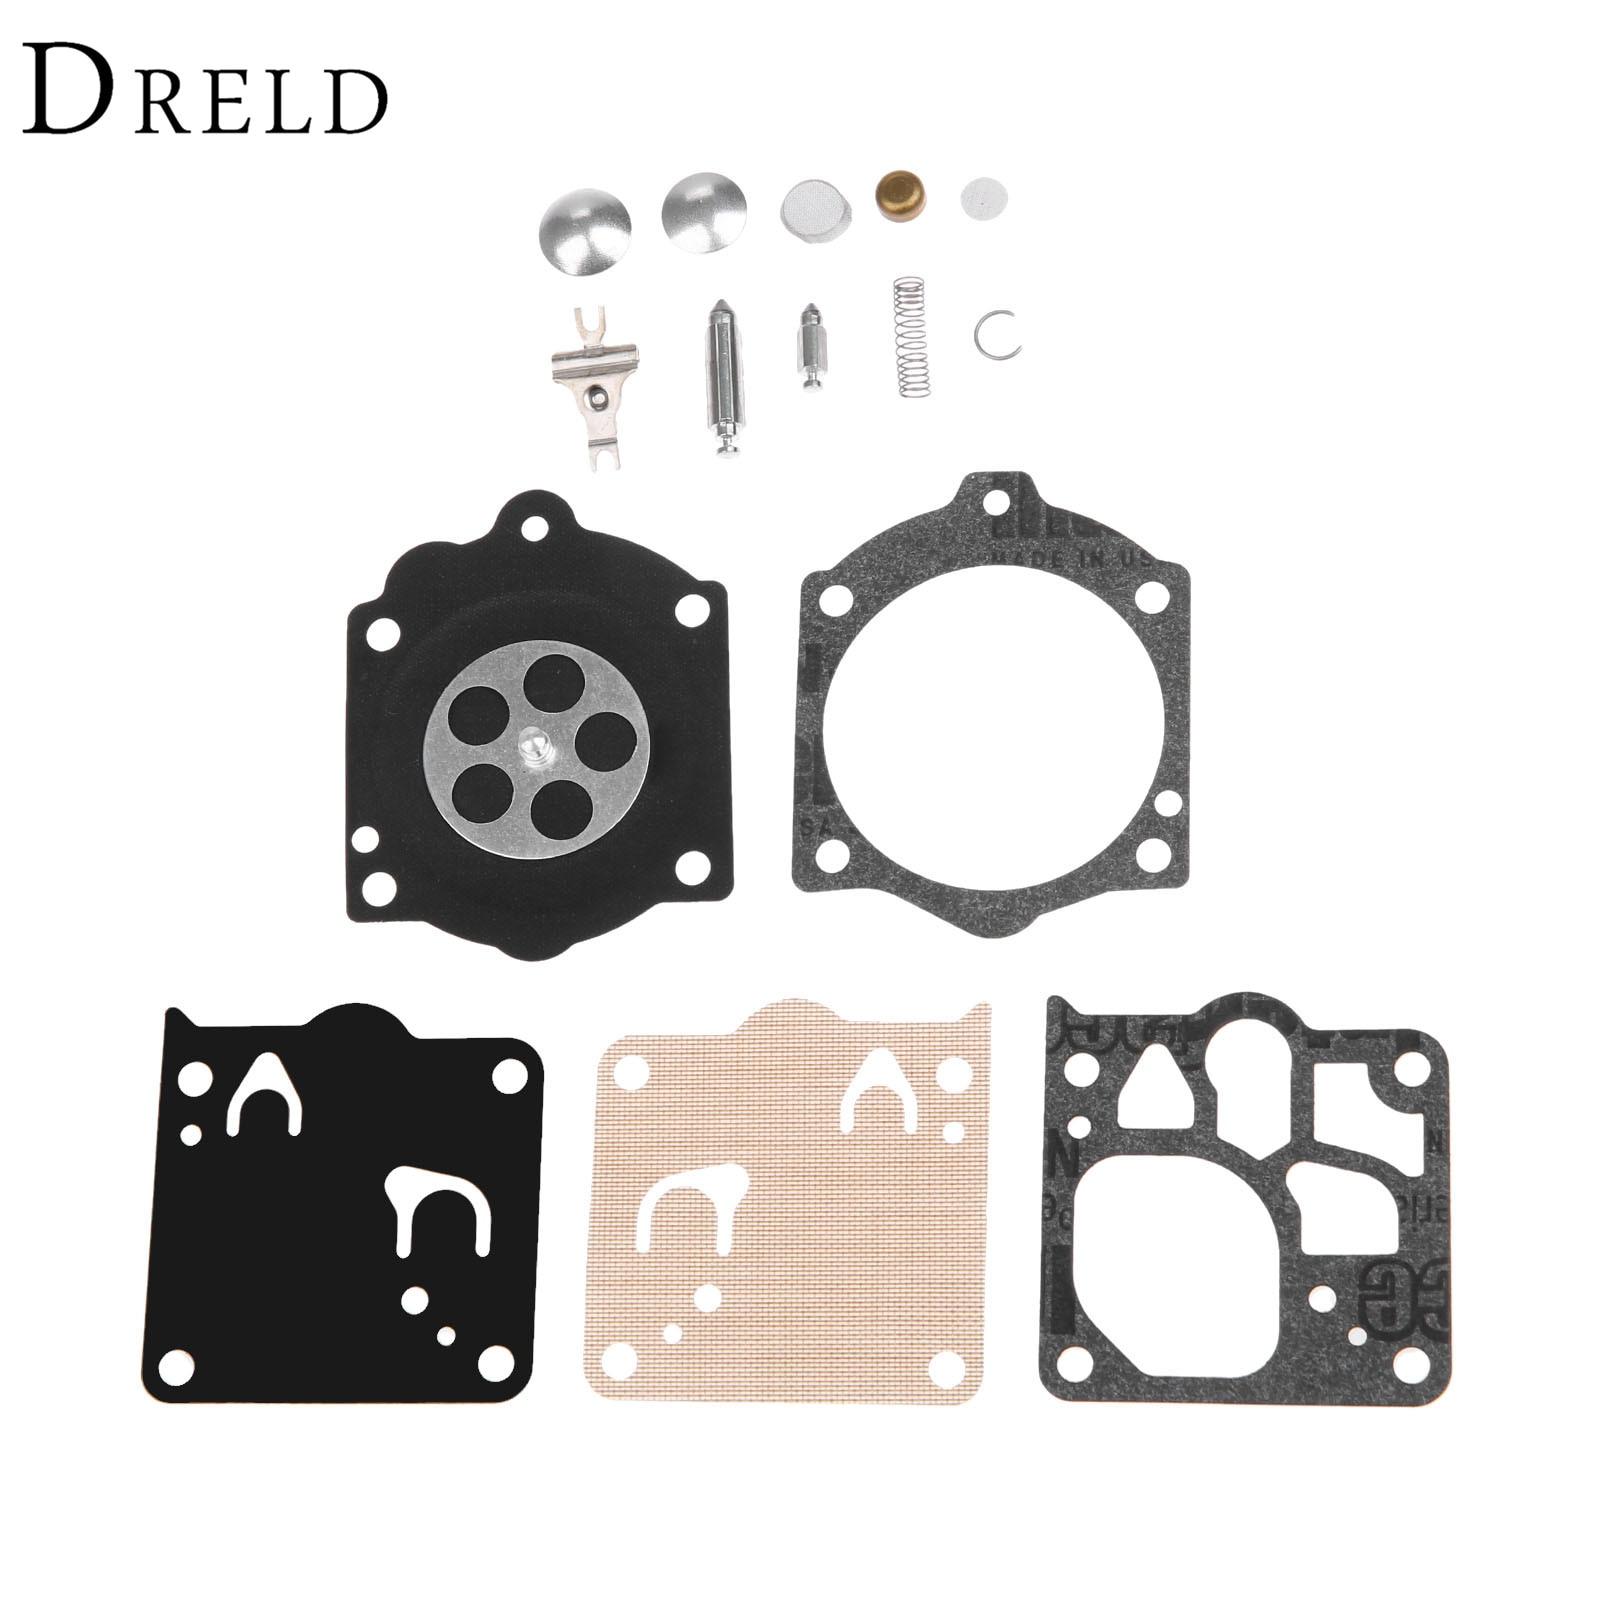 DRELD Vergaser Carb Rebuild Kit Dichtung Membran für Stihl MS660 Kettensäge Walbro WJ Carb Ersetzen Walbro K10-WJ/Neue K12-WJ